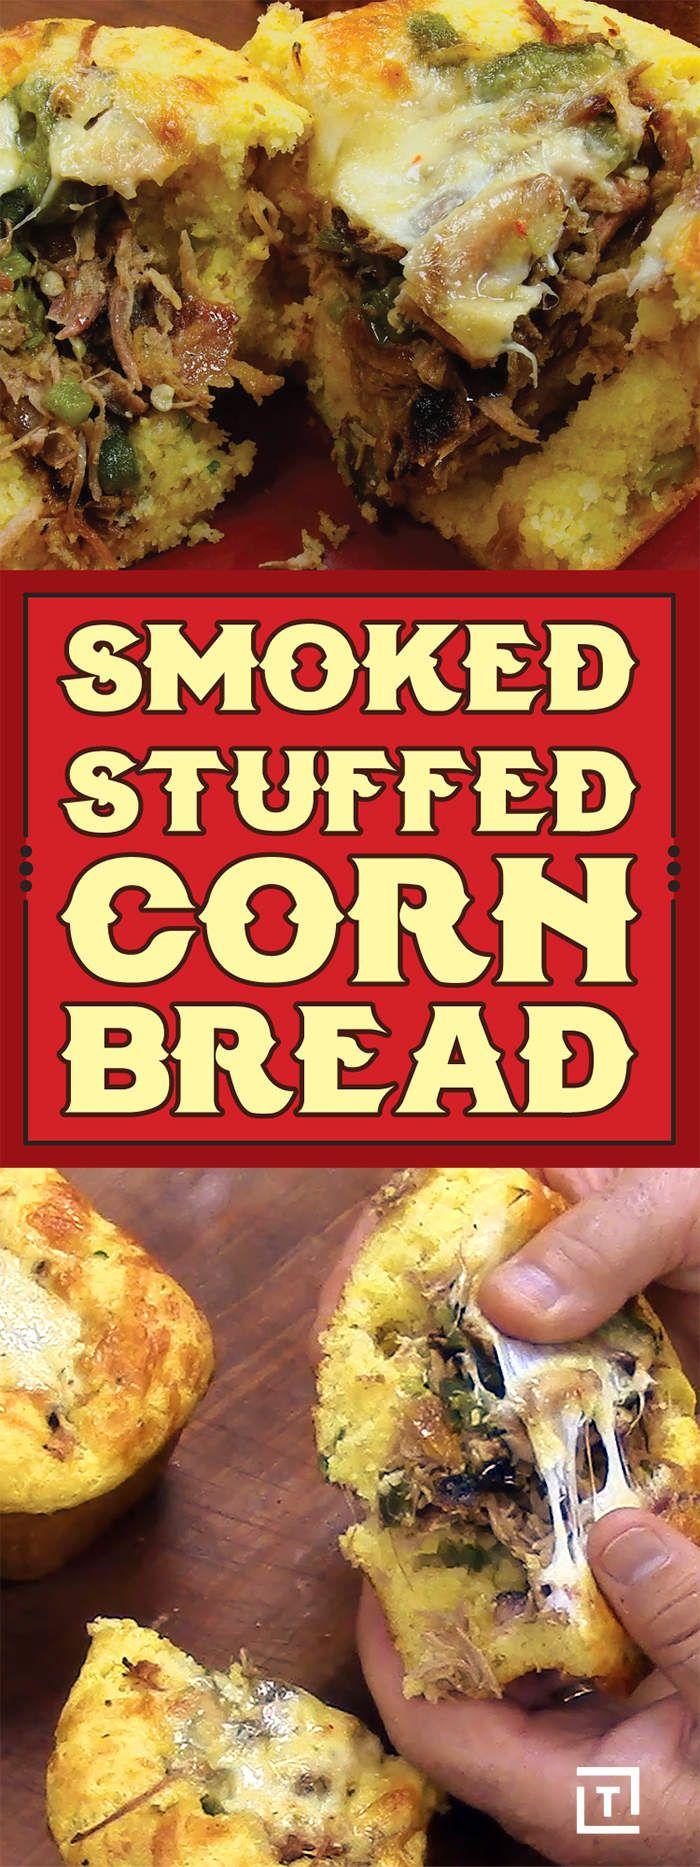 Smoked Stuffed Cornbread Recipe Video - Thrillist